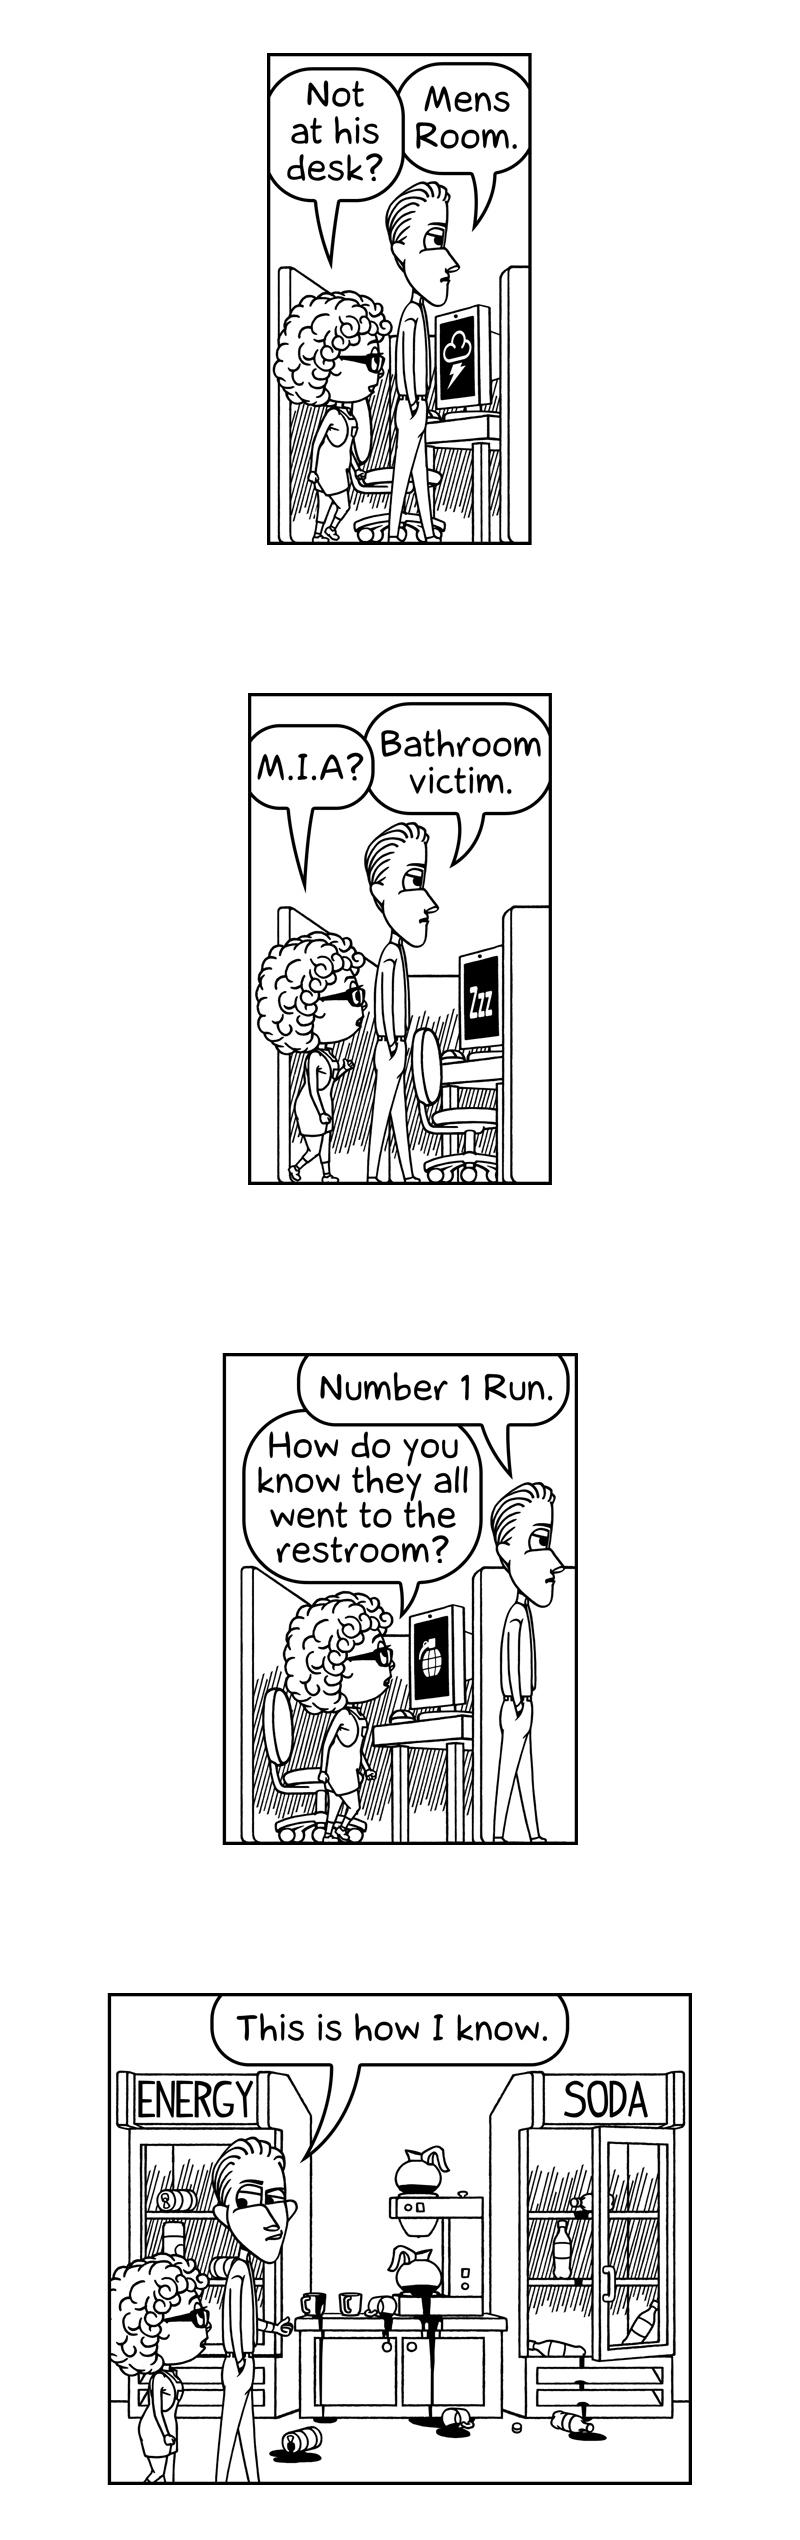 020 | Number 1 Run